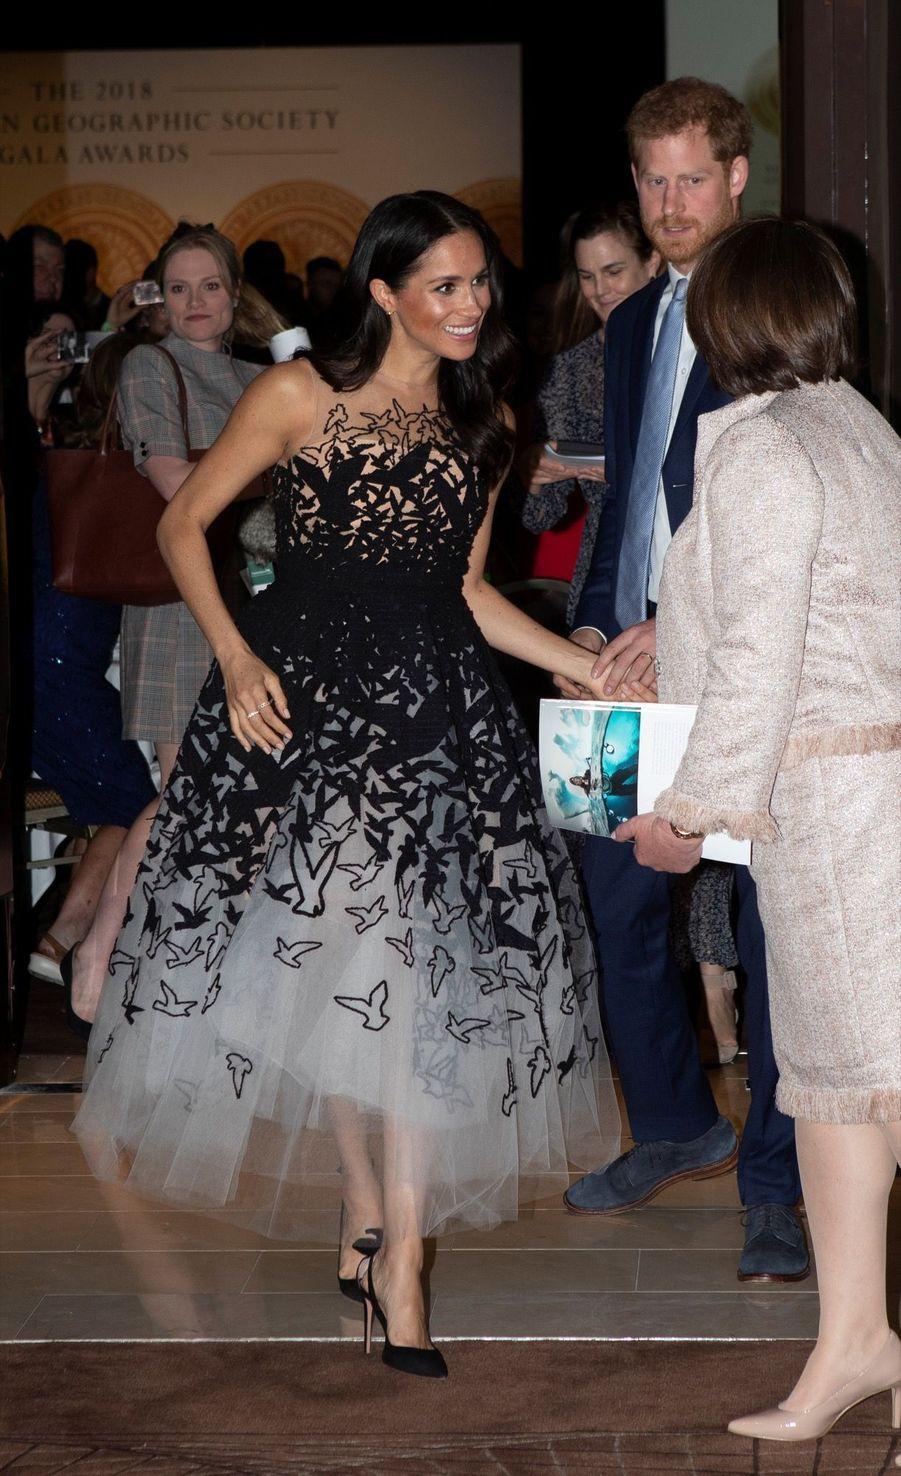 Meghan Et Harry Au Australian Geographic Society Gala Awards ( 1